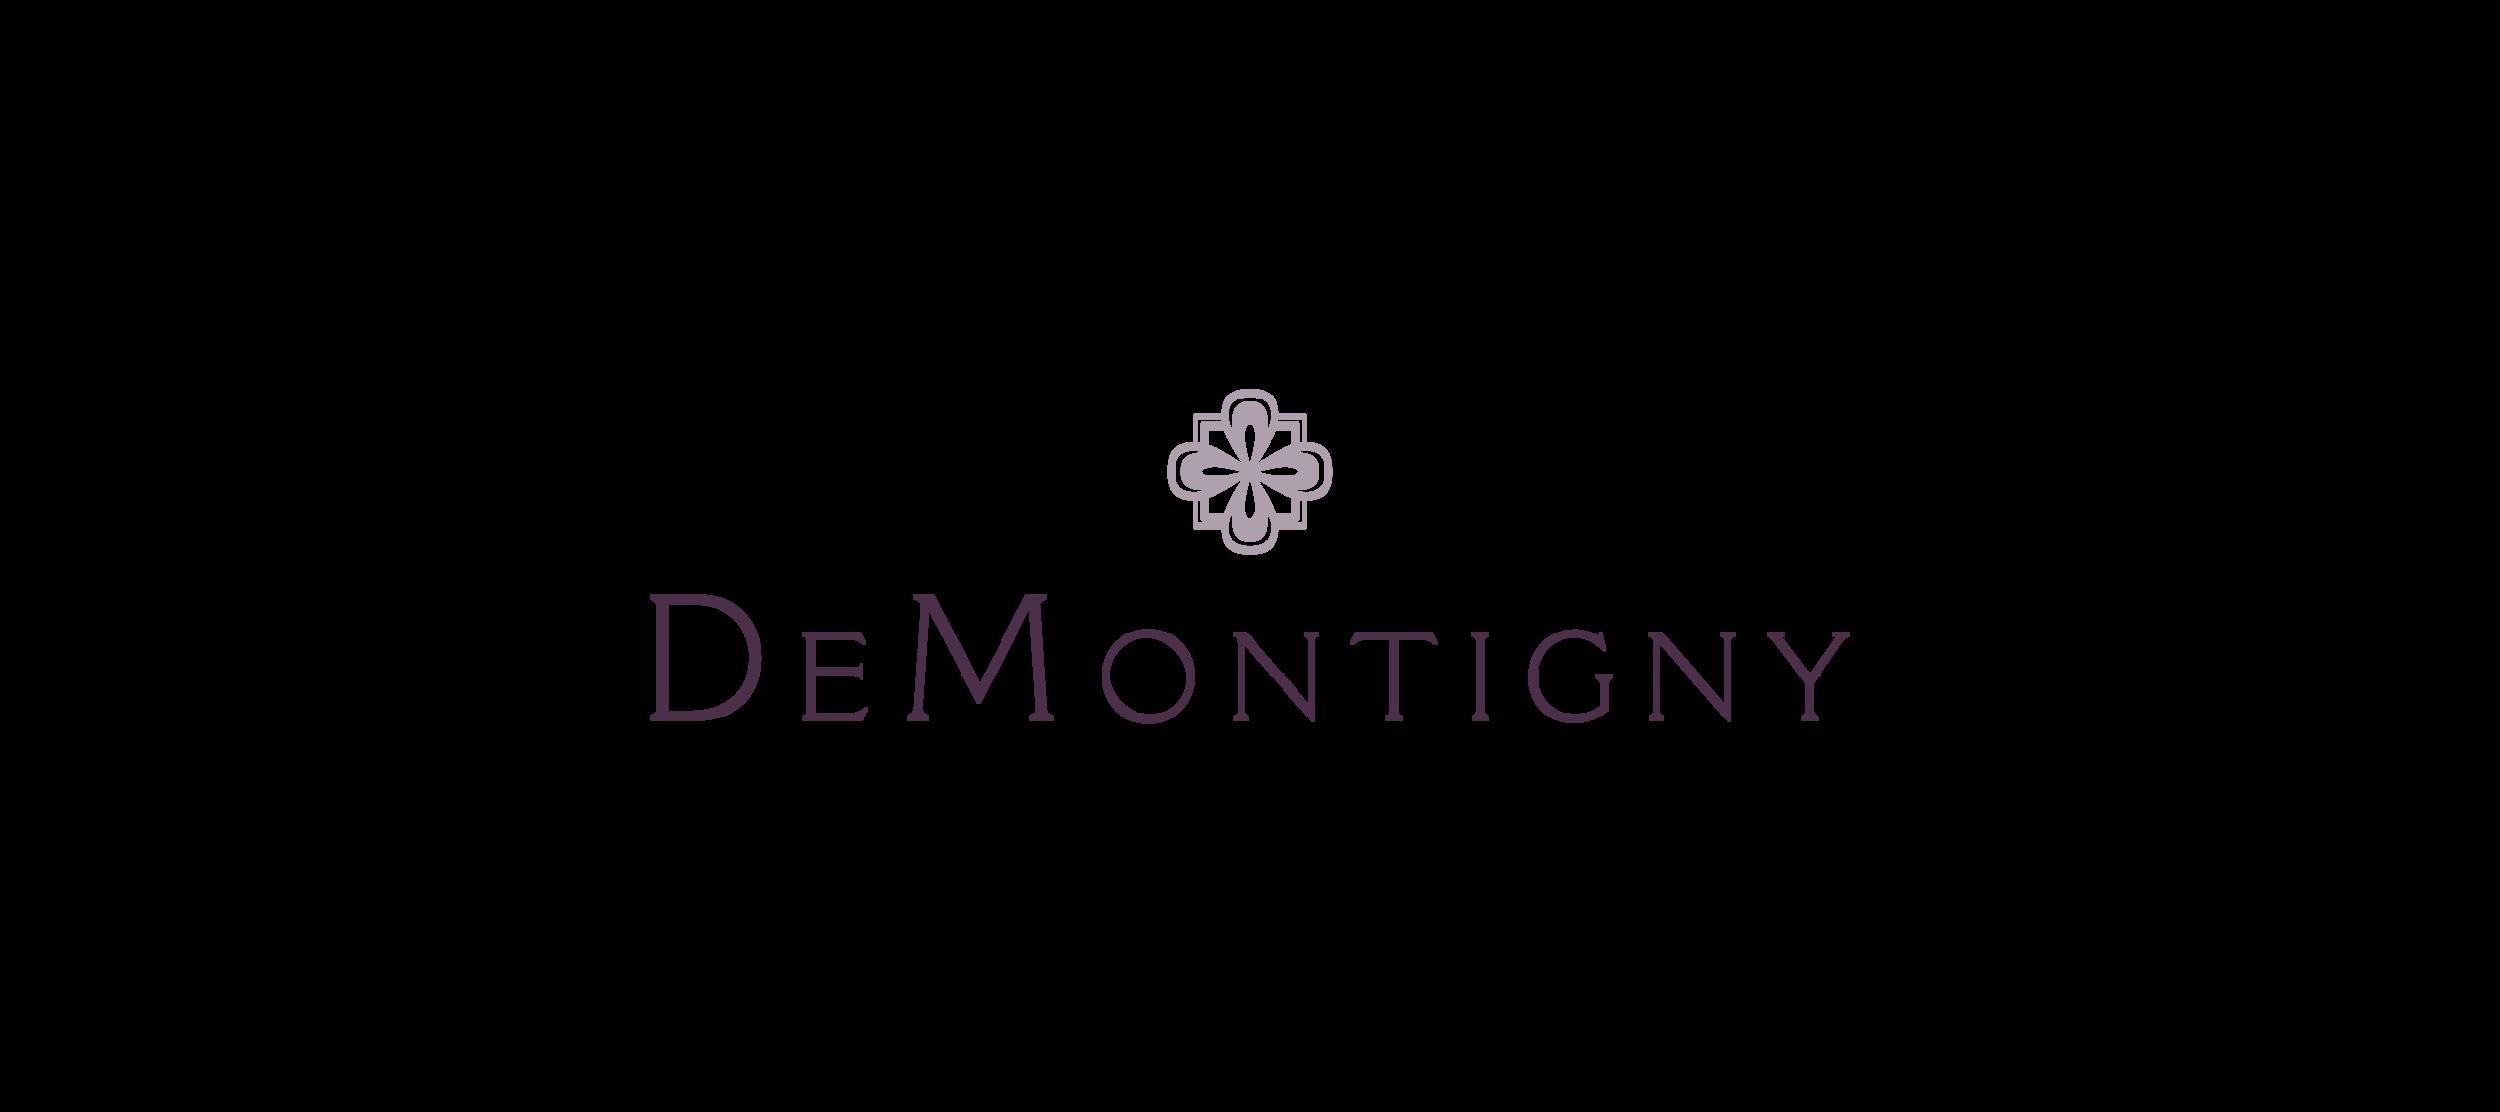 demontigny-main-logo.png